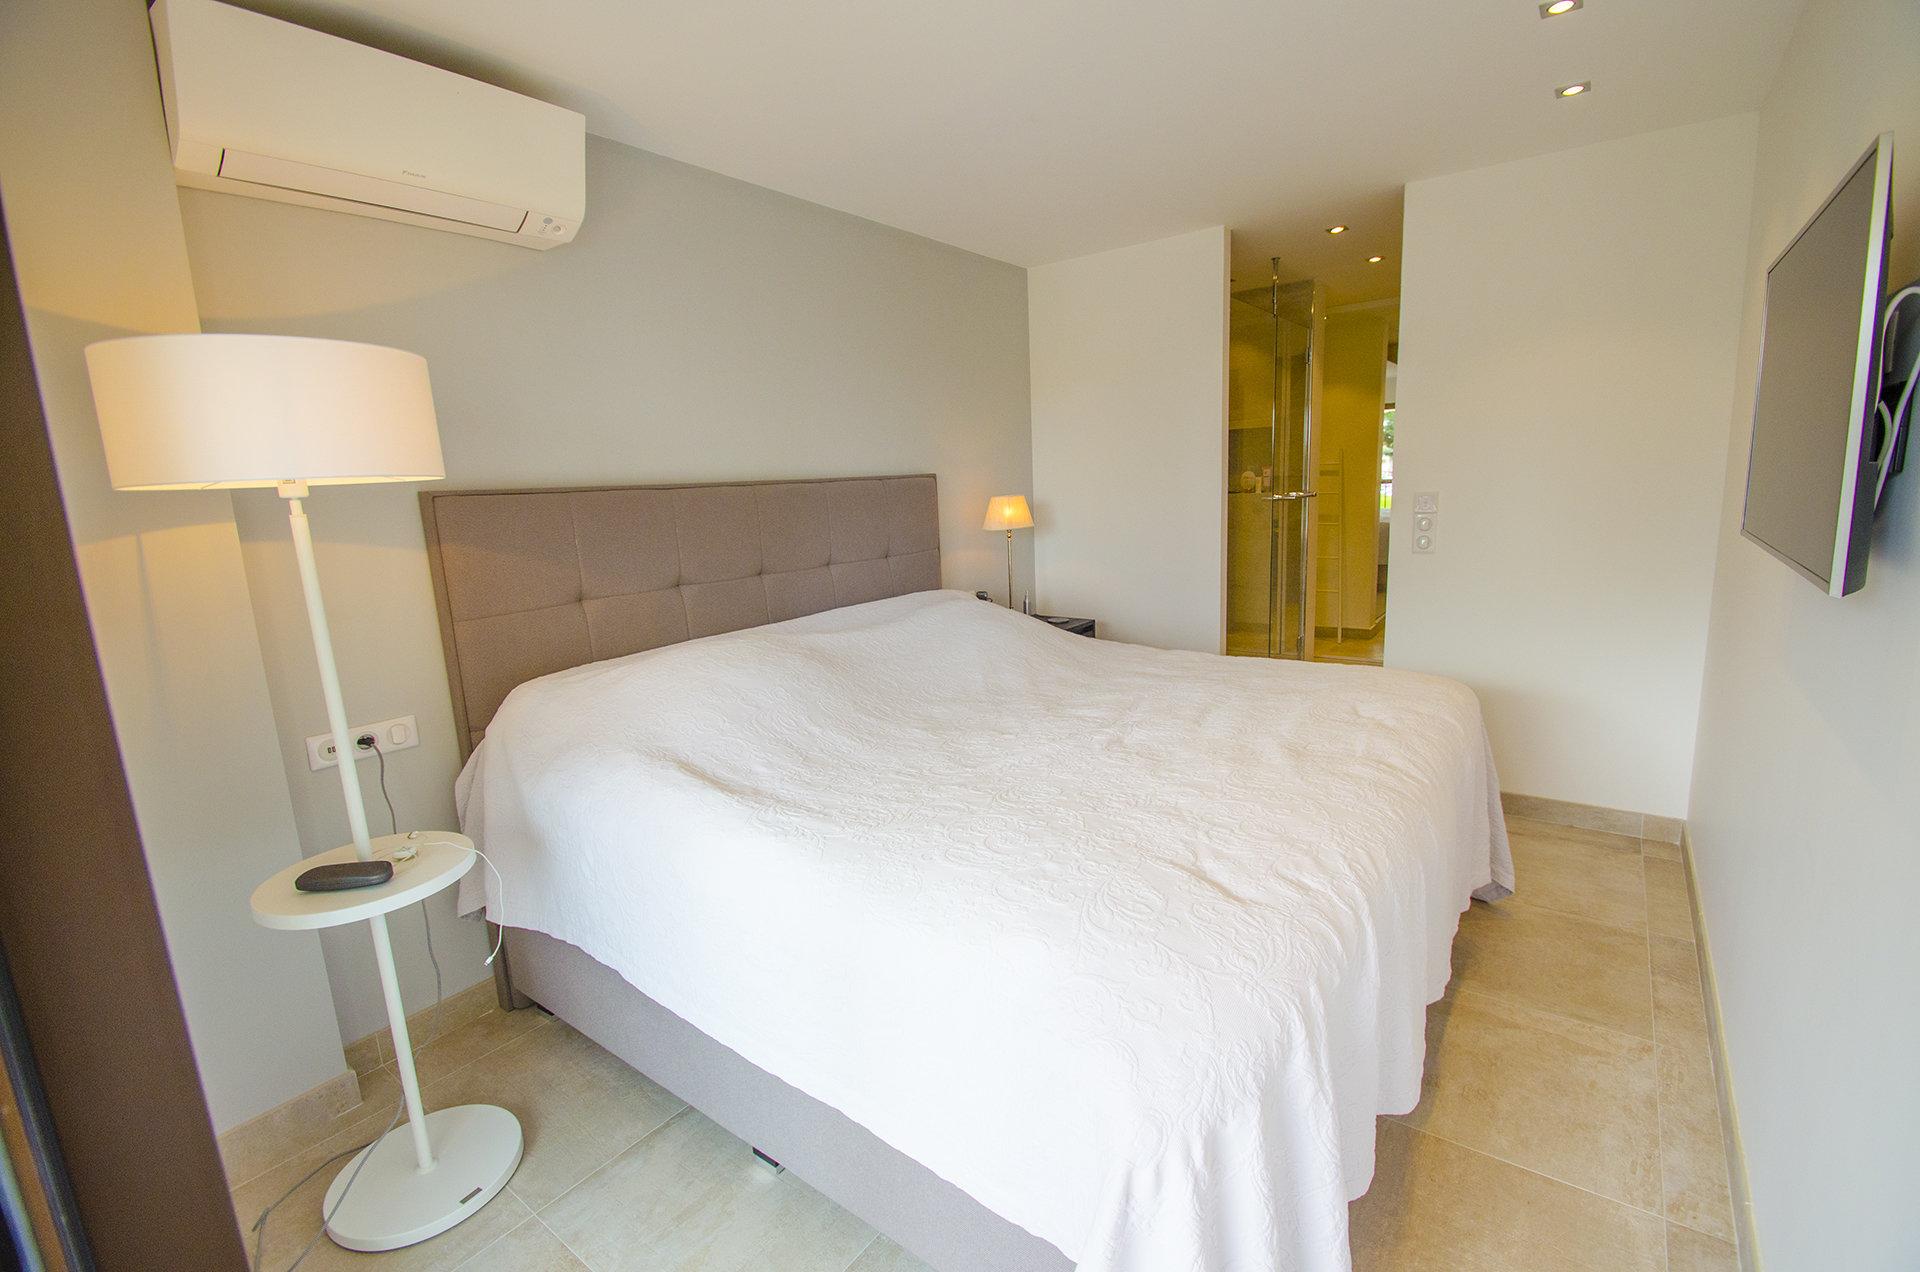 3 bedroom apartment in the Masters - Mandelieu la Napoule